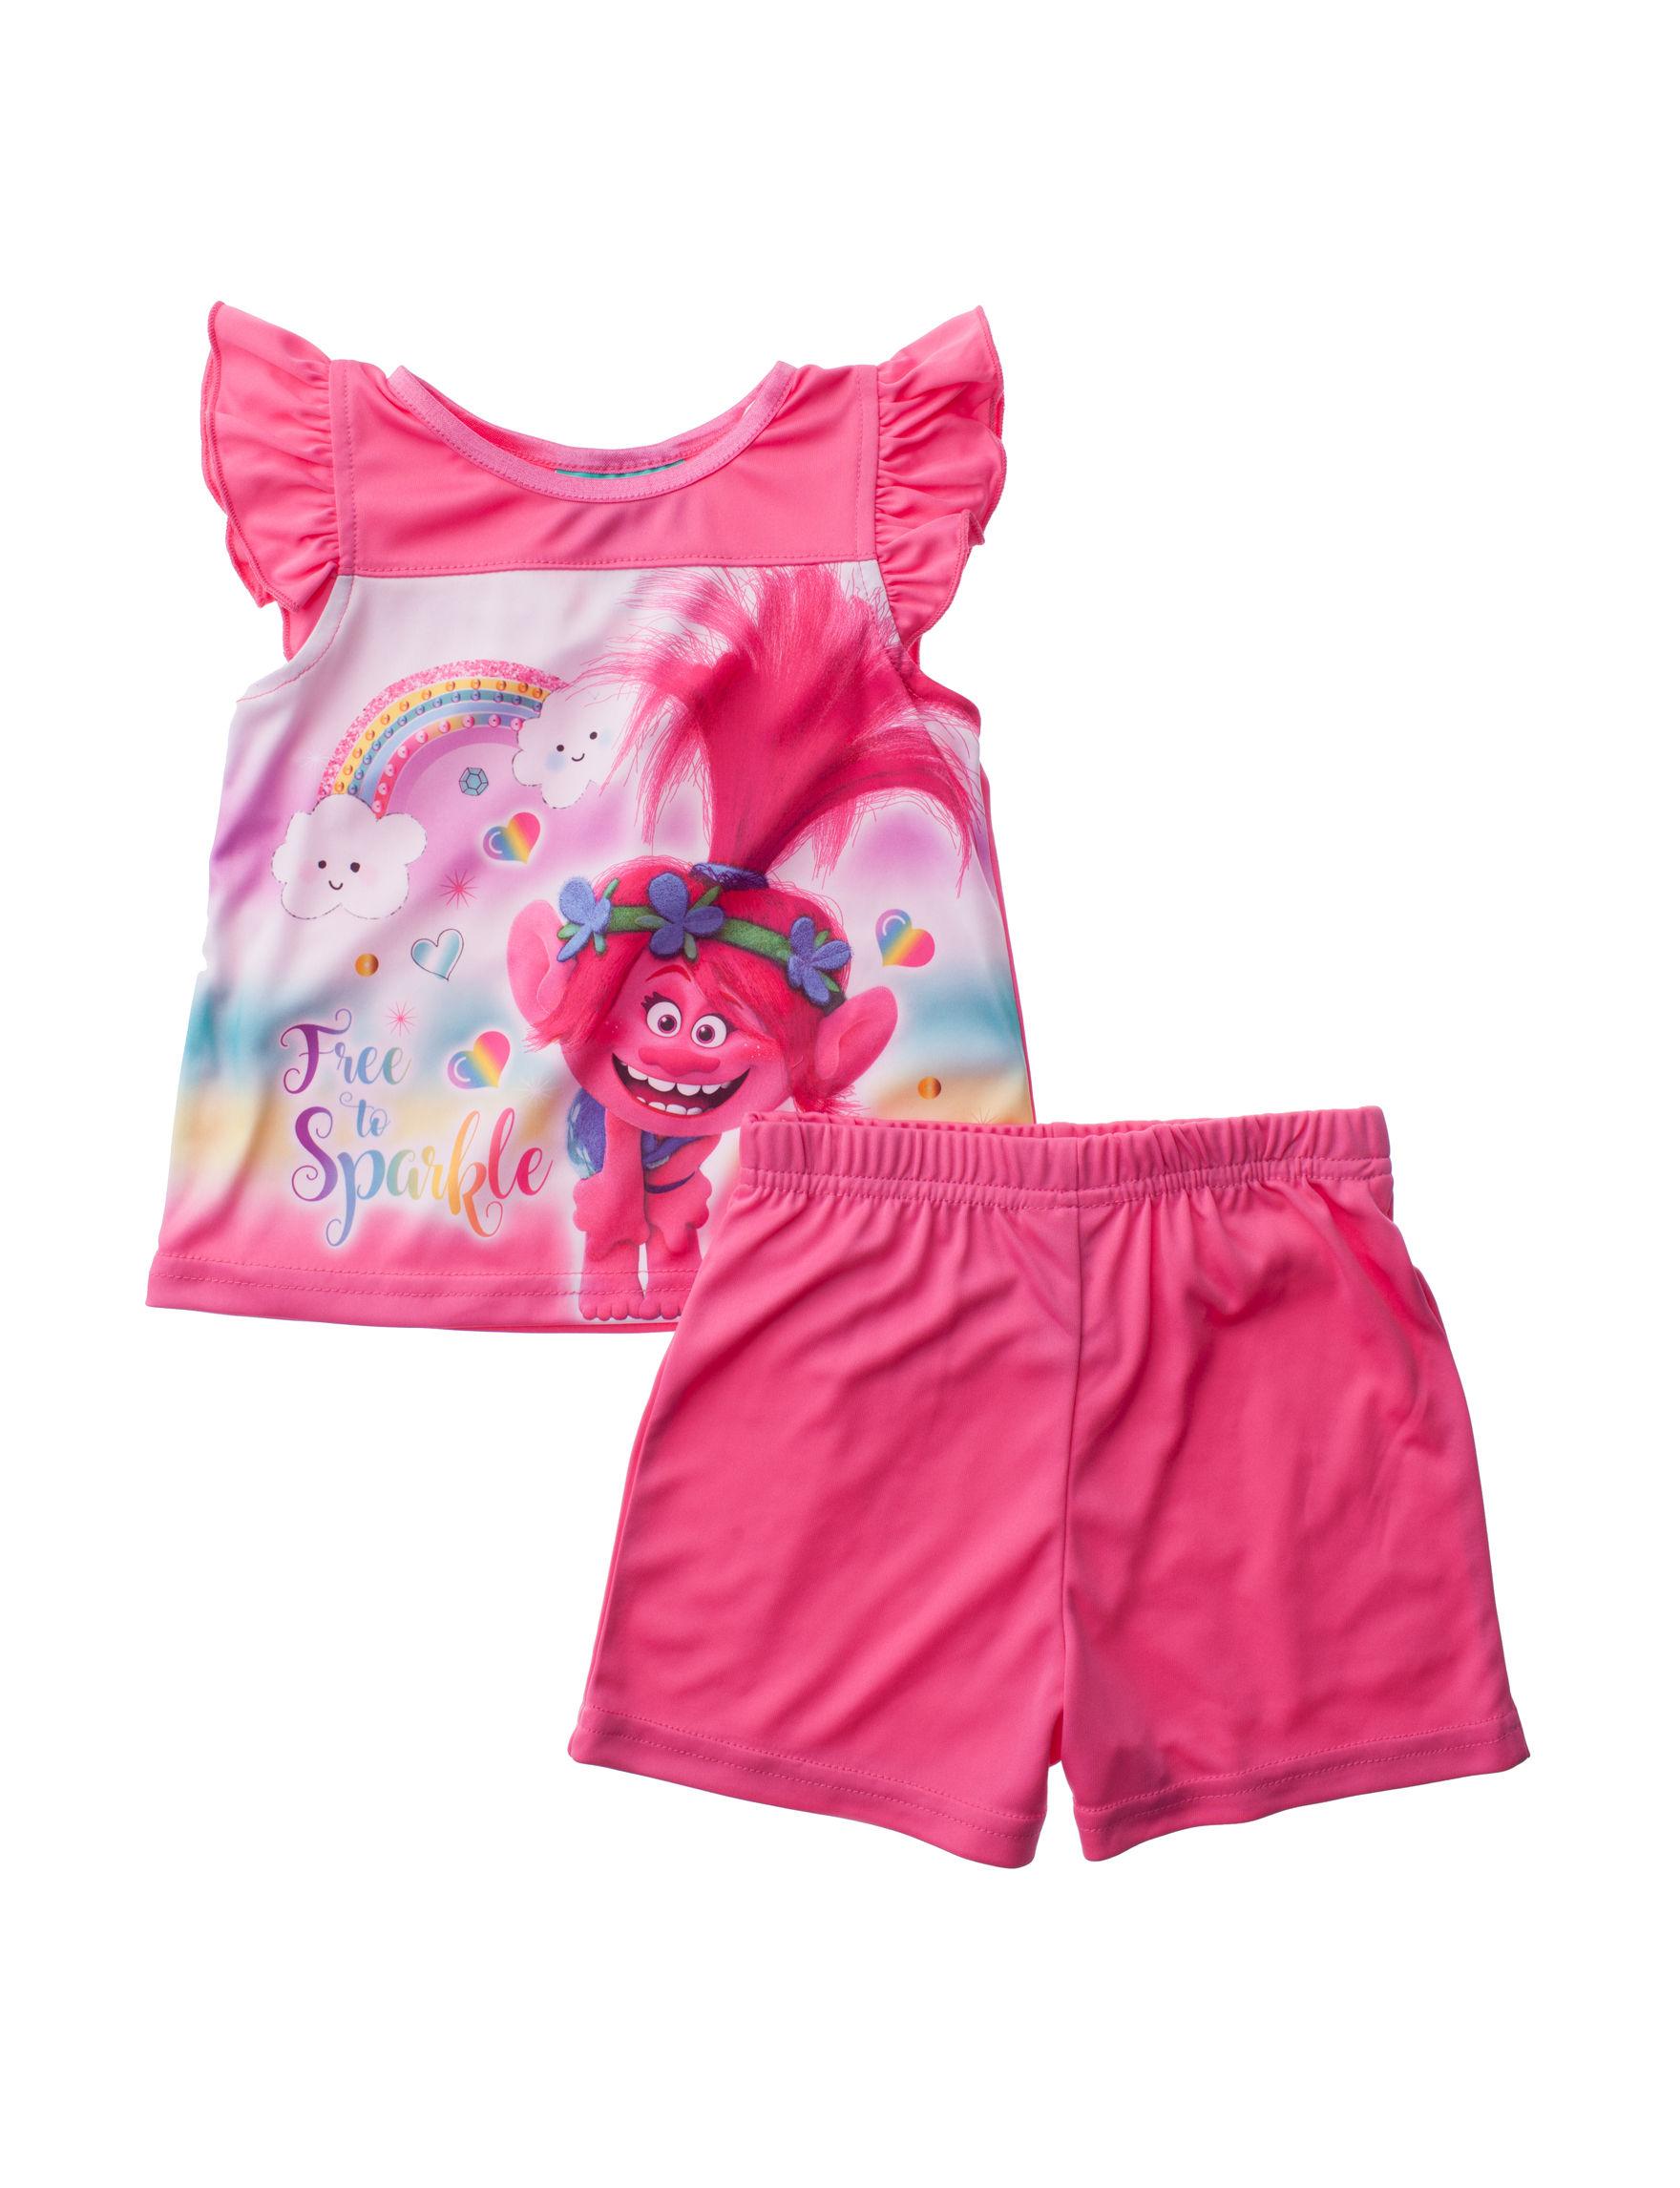 Licensed Pink Multi Pajama Sets